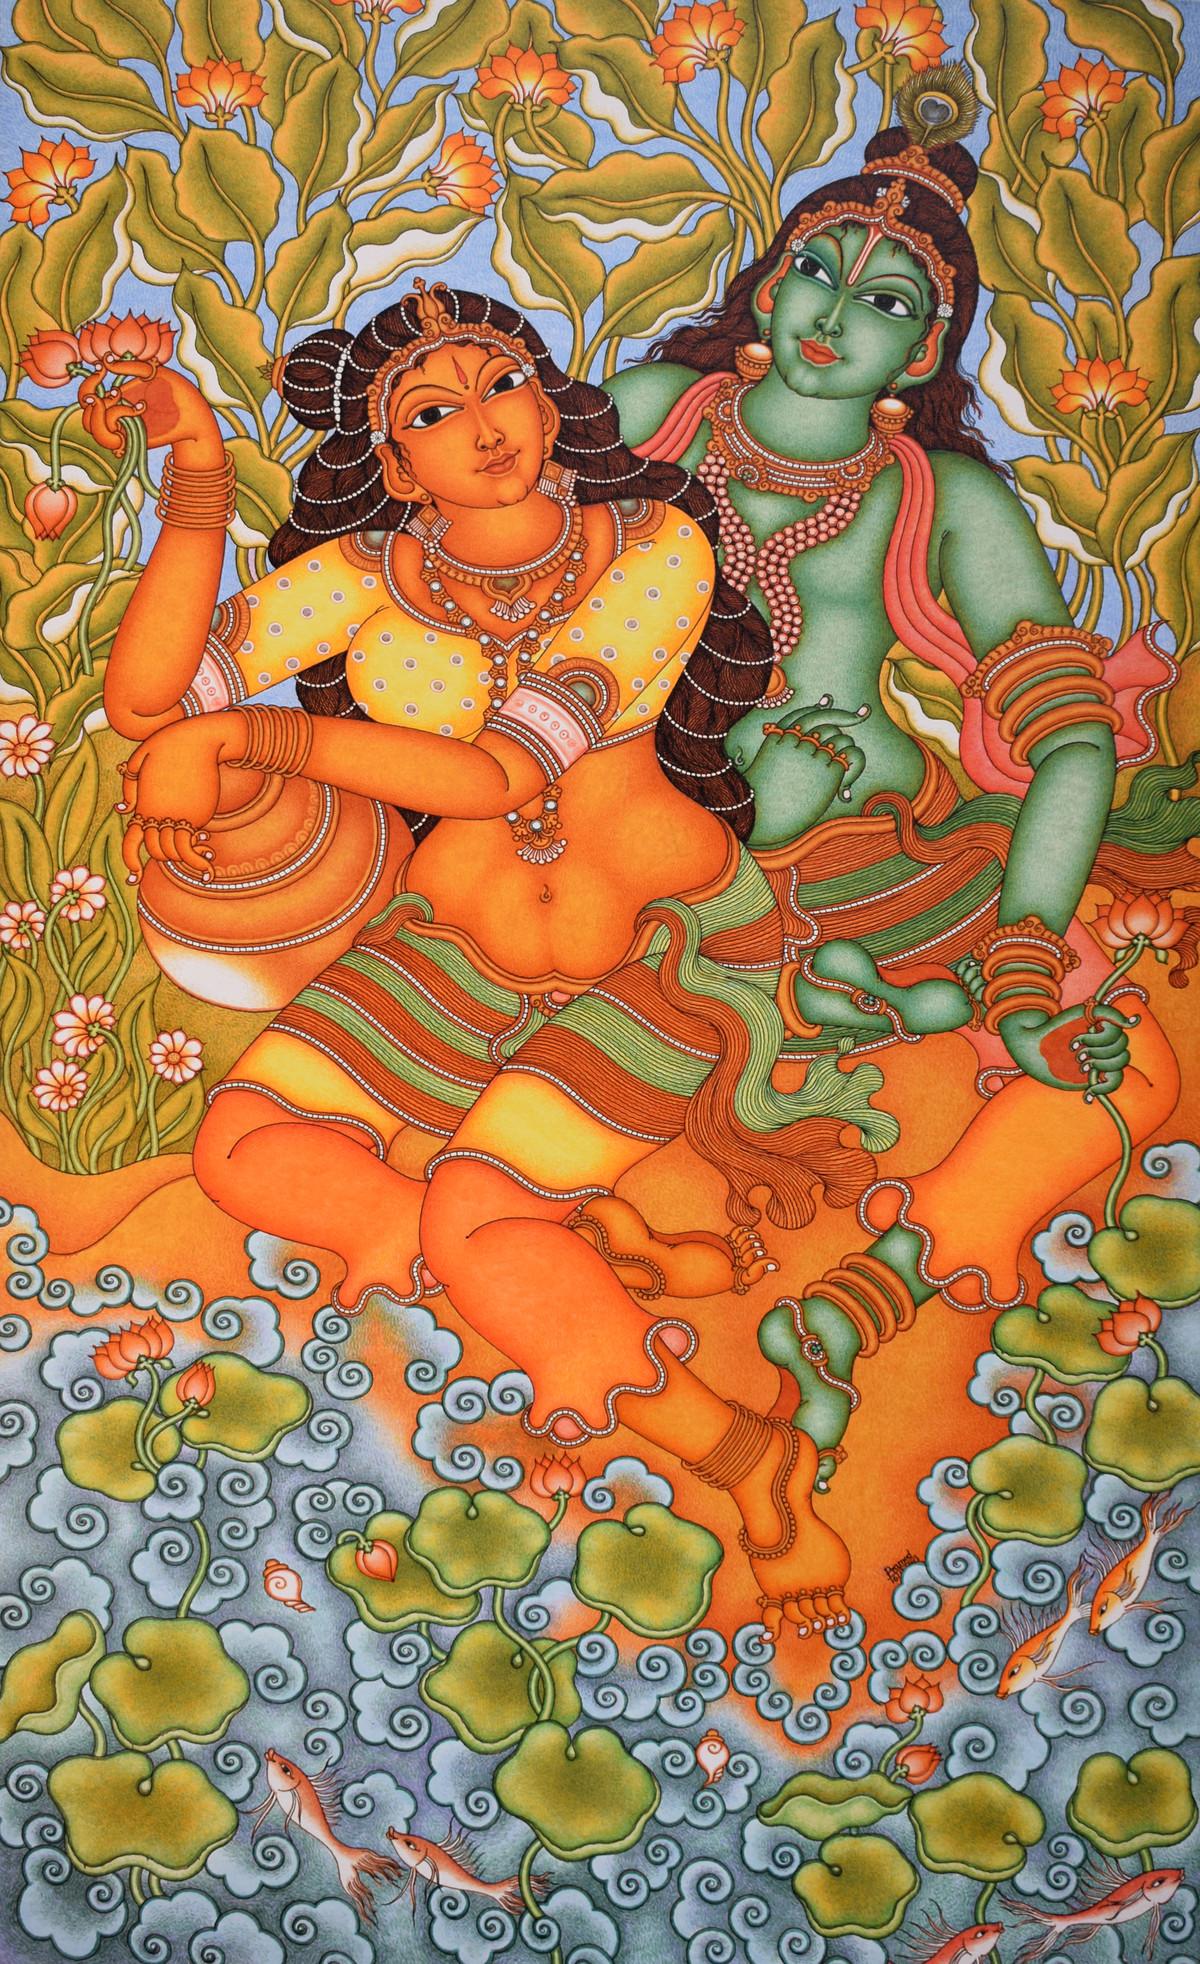 kerala mural painting by artist unknown artist